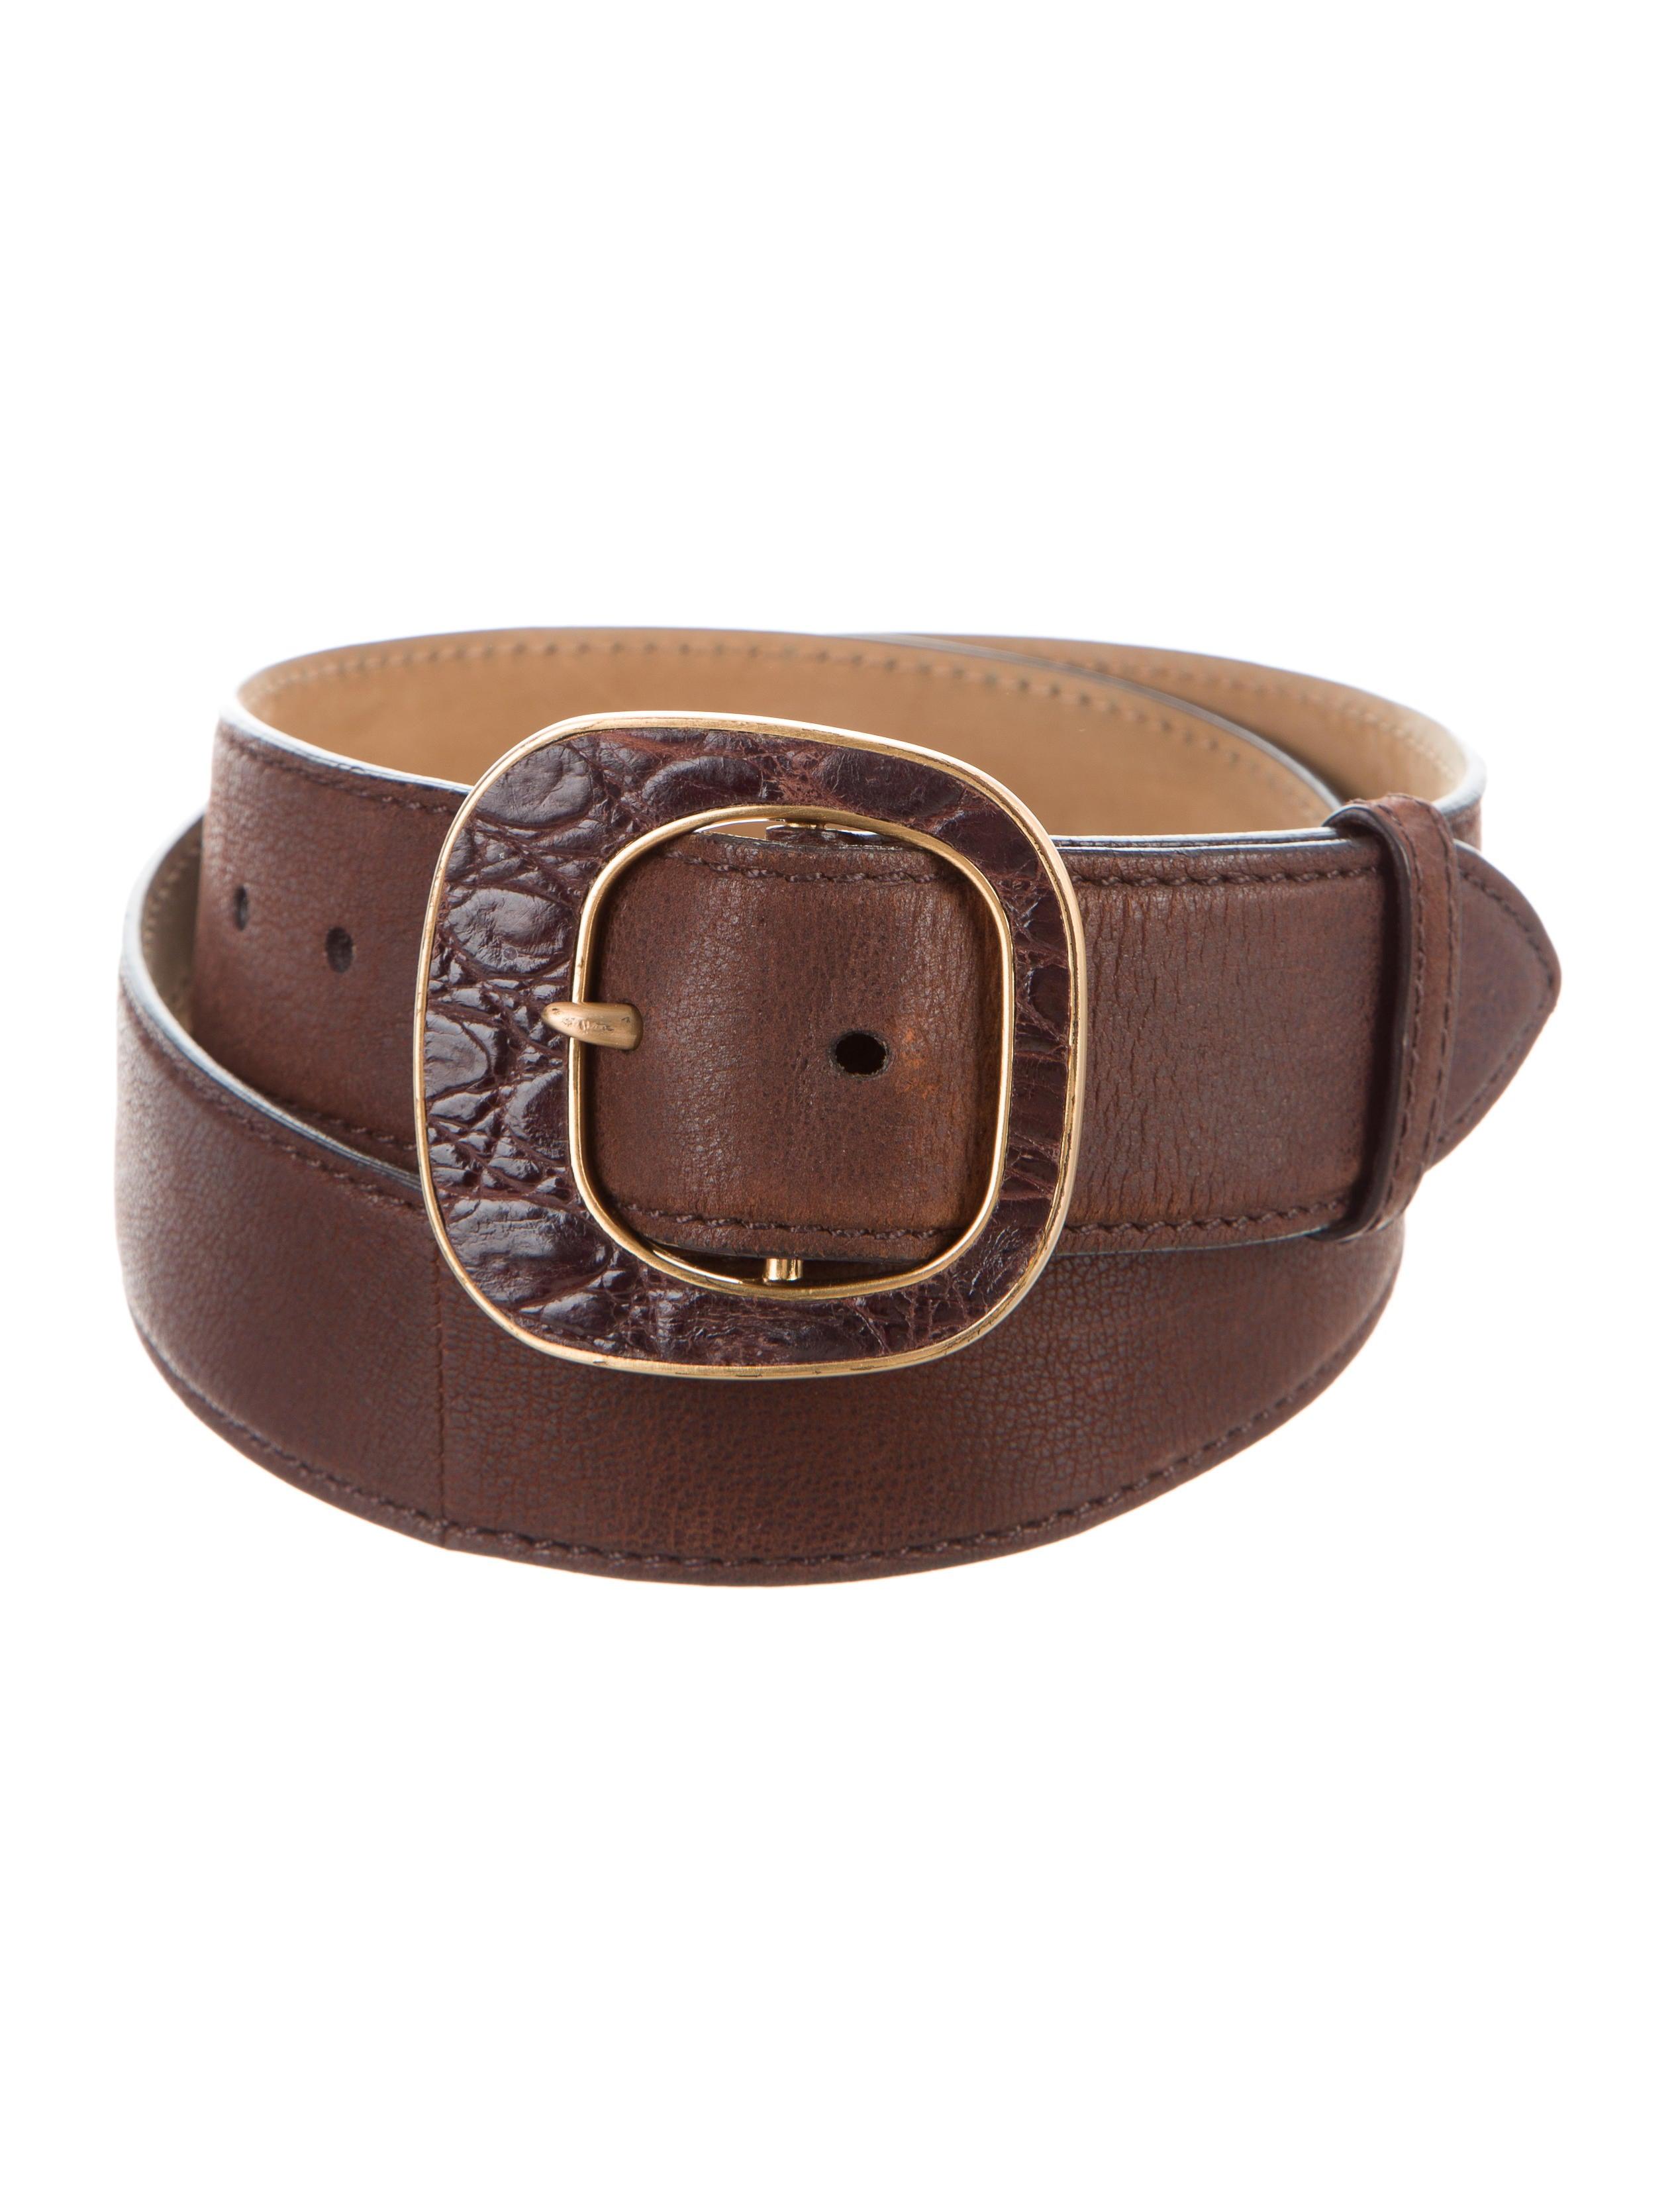 prada leather buckle belt accessories pra164128 the